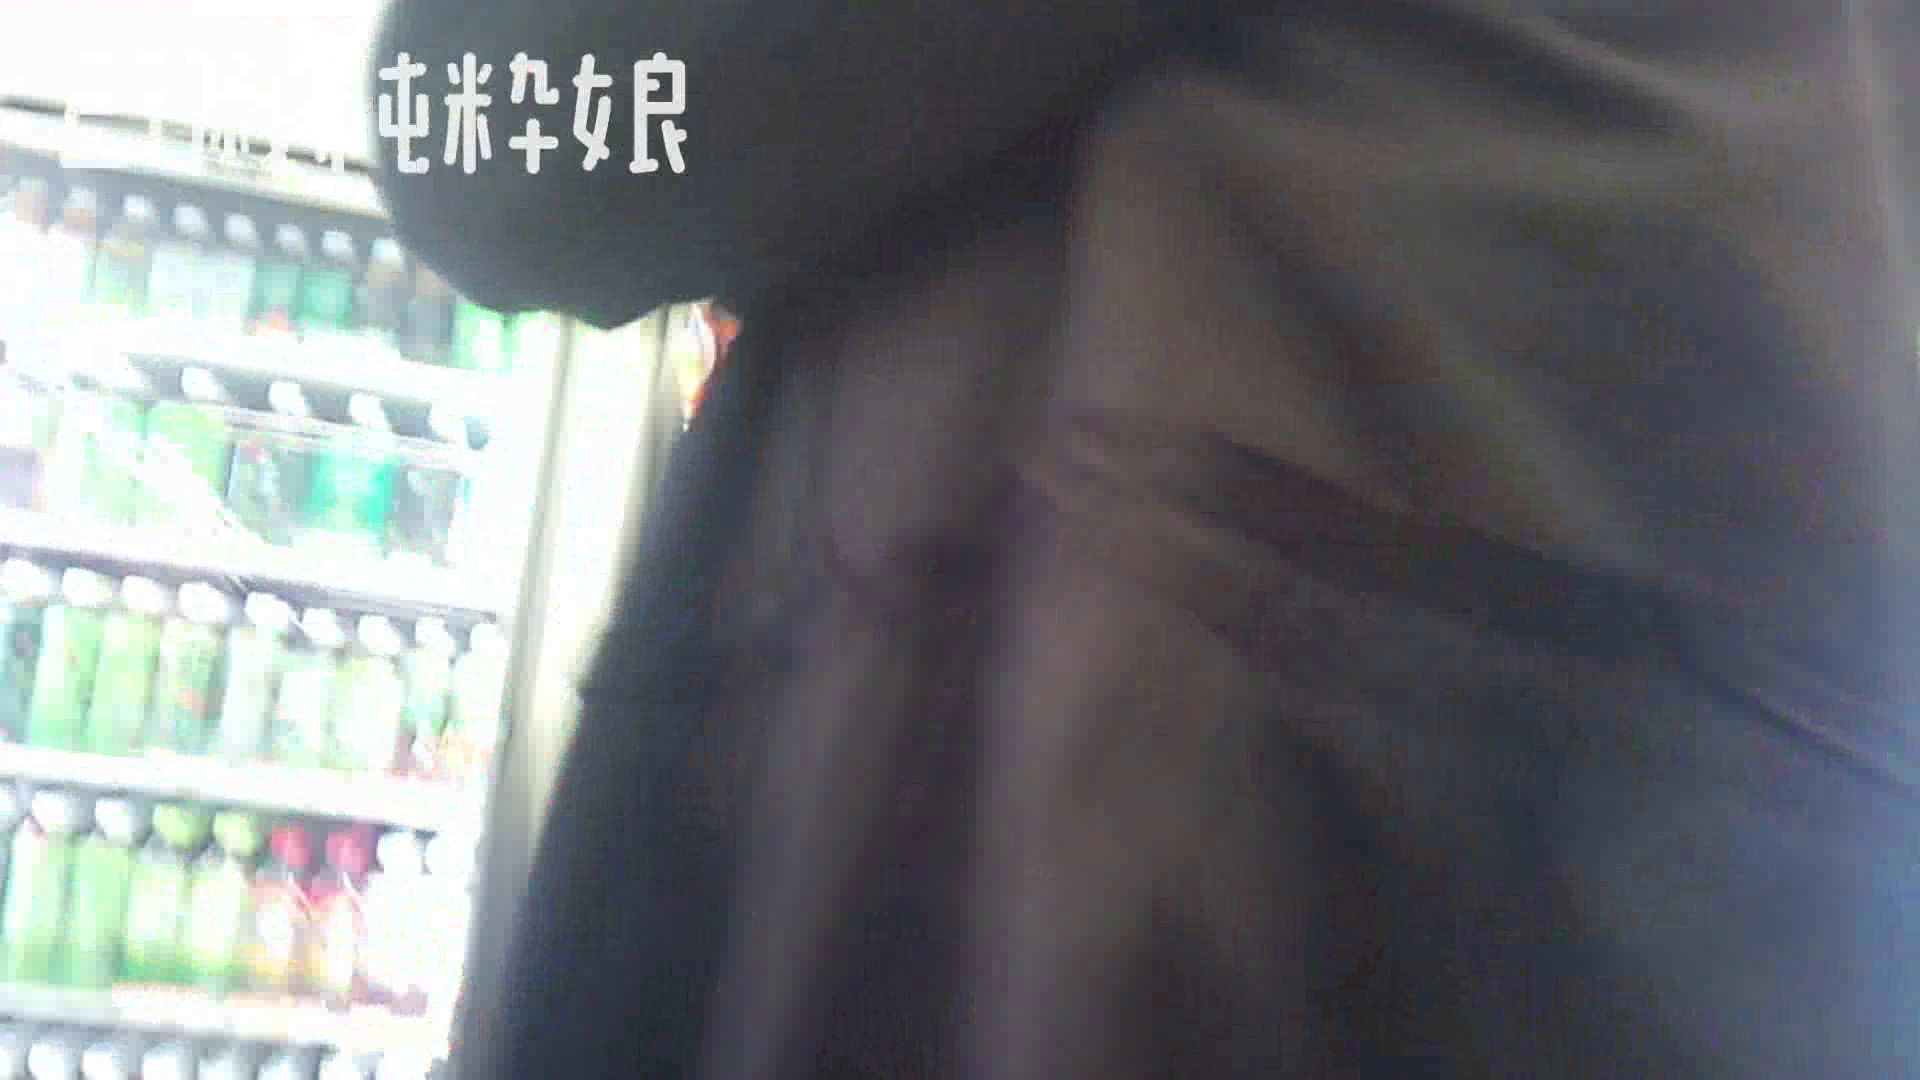 Gカップ21歳純粋嬢第2弾Vol.5 性欲丸出し | 学校  101pic 10